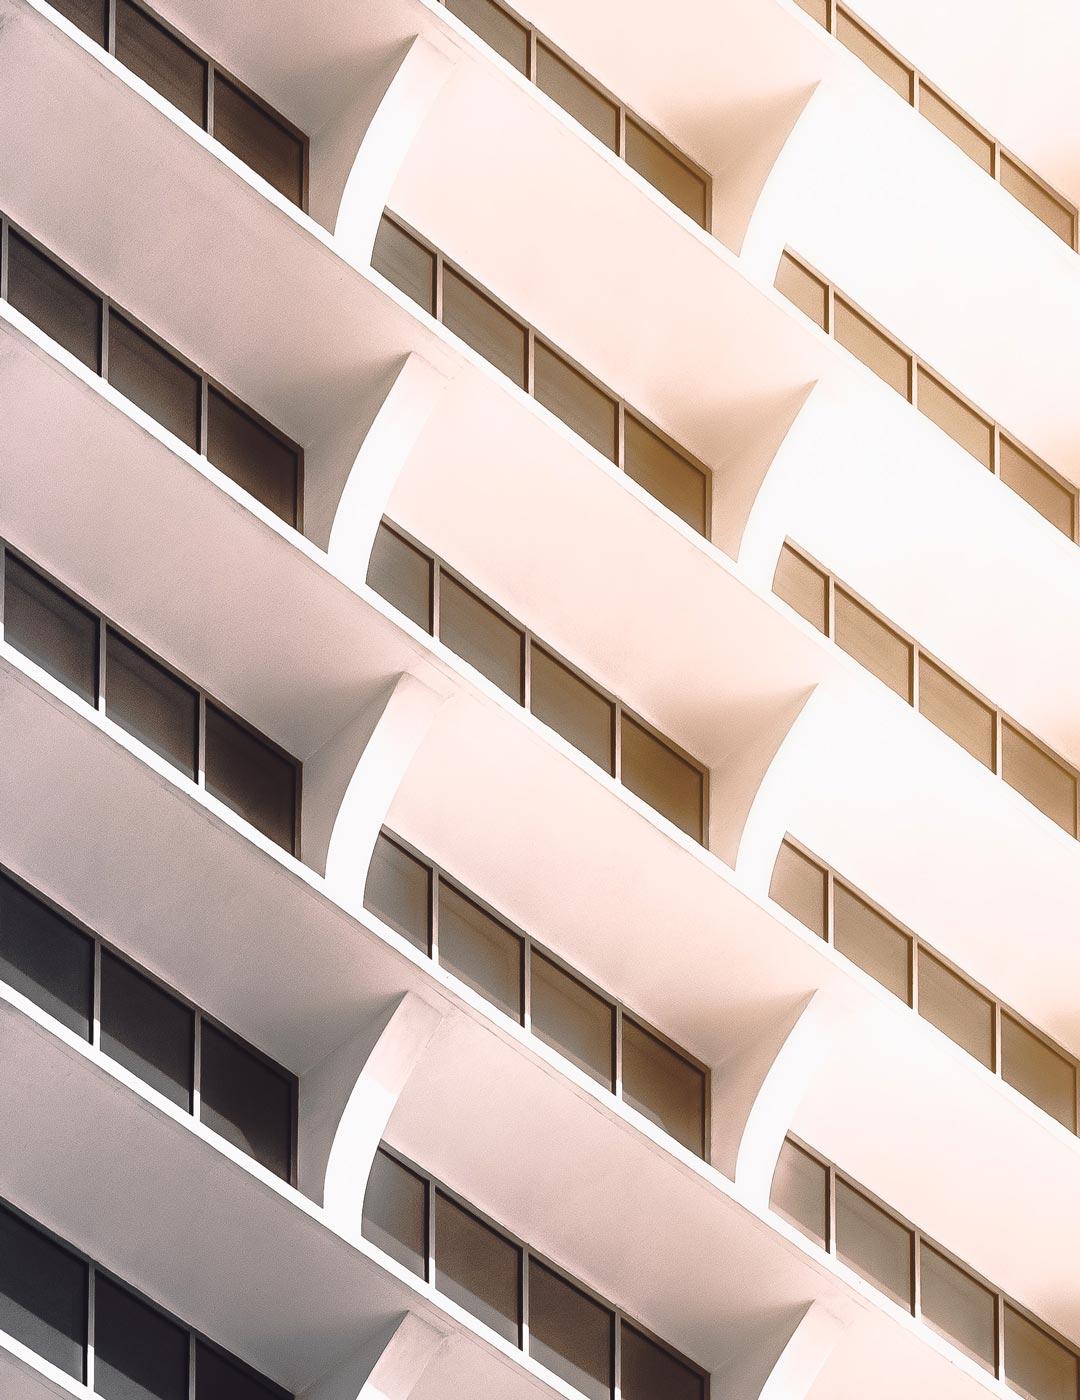 gray-and-white-concrete-building-3790058